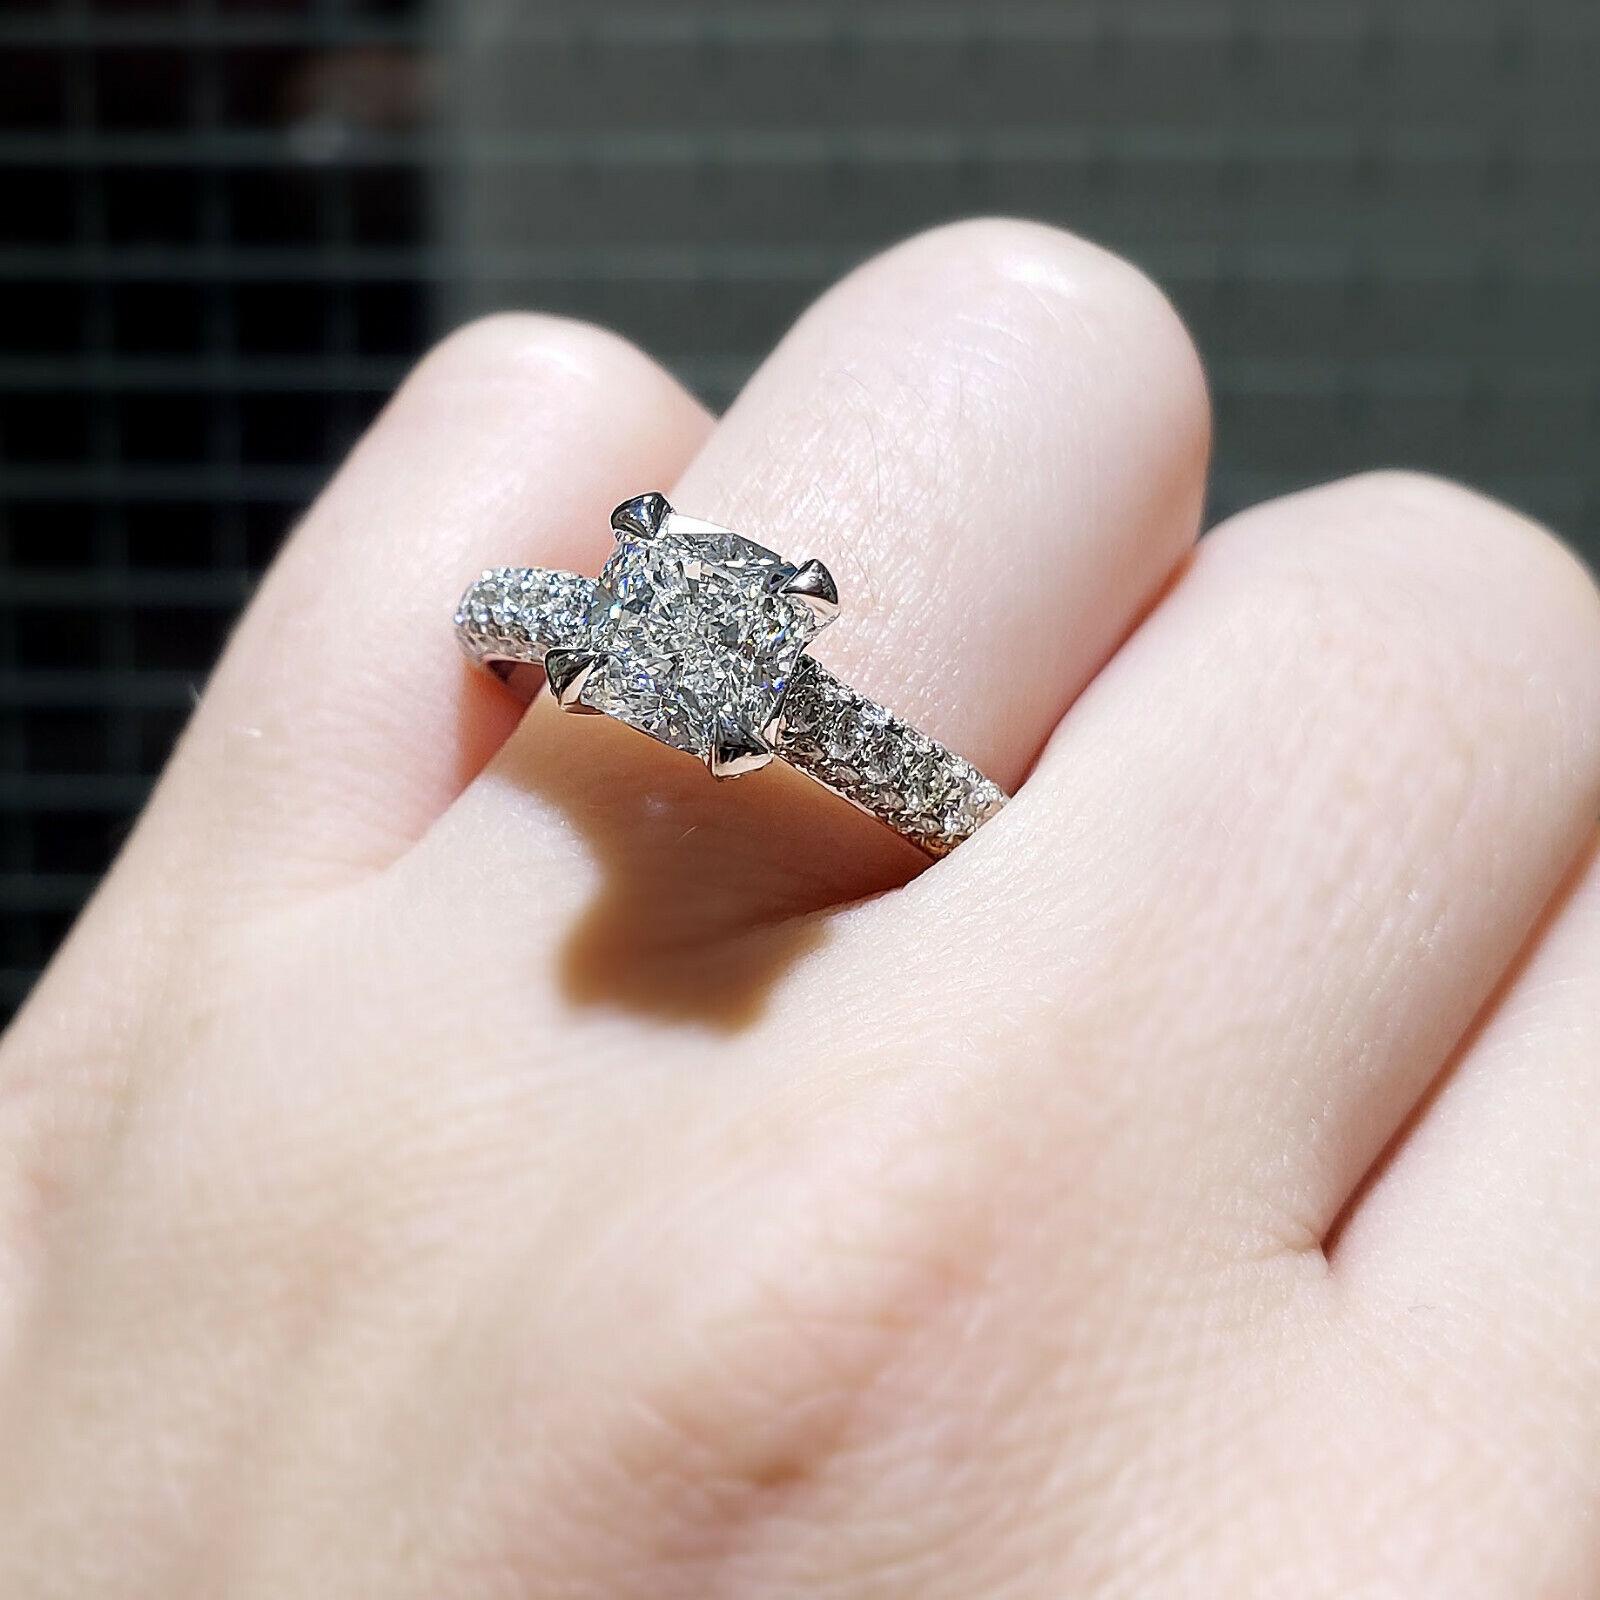 3.10 Ct Cushion Cut Diamond Engagement Ring Round Cut Micro Pave H,VS1 GIA 14K 1